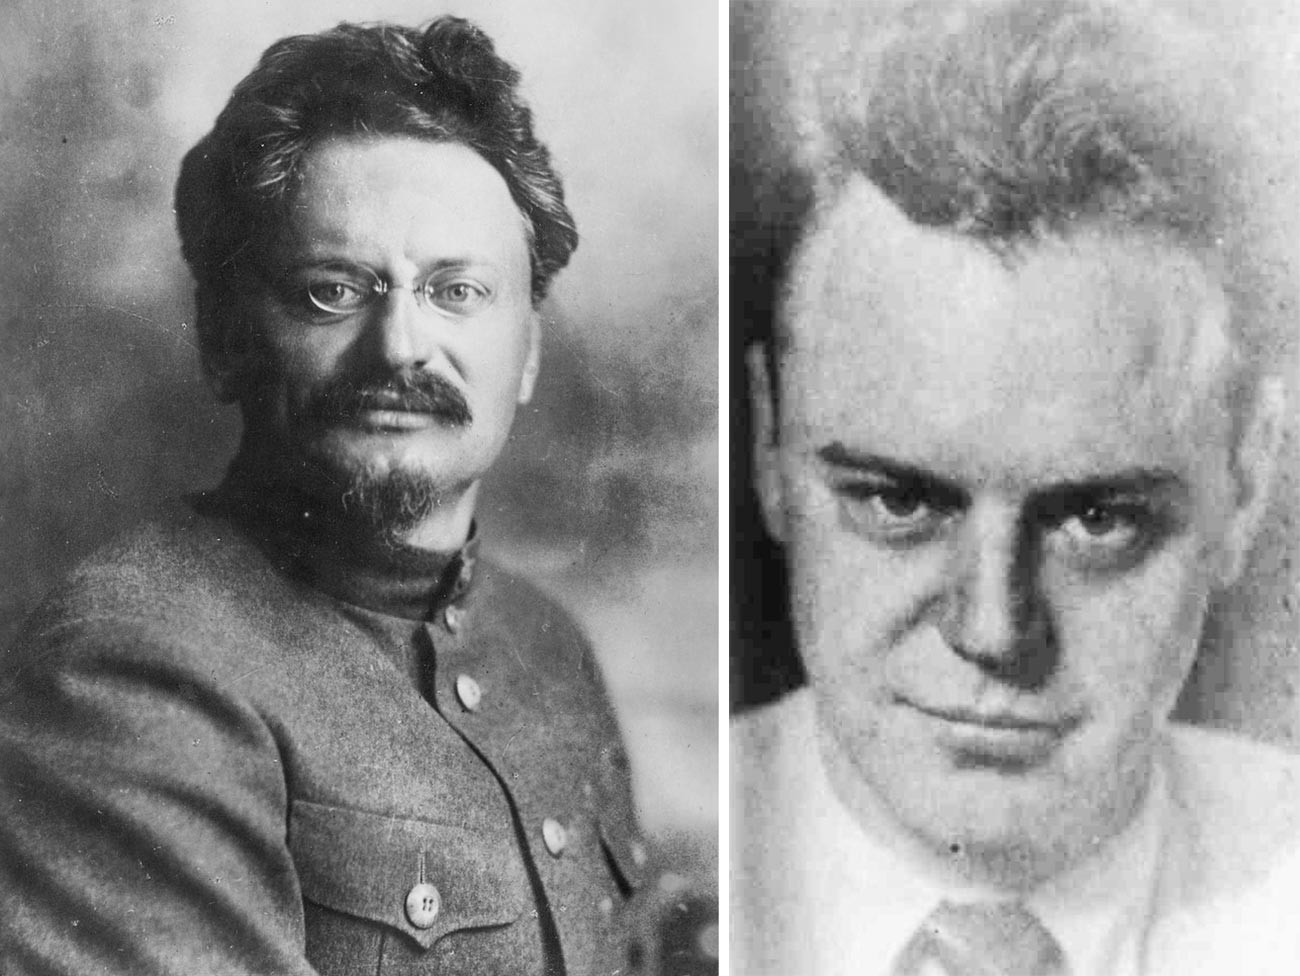 レフ・トロツキー(左)とレフ・セドフ(右)